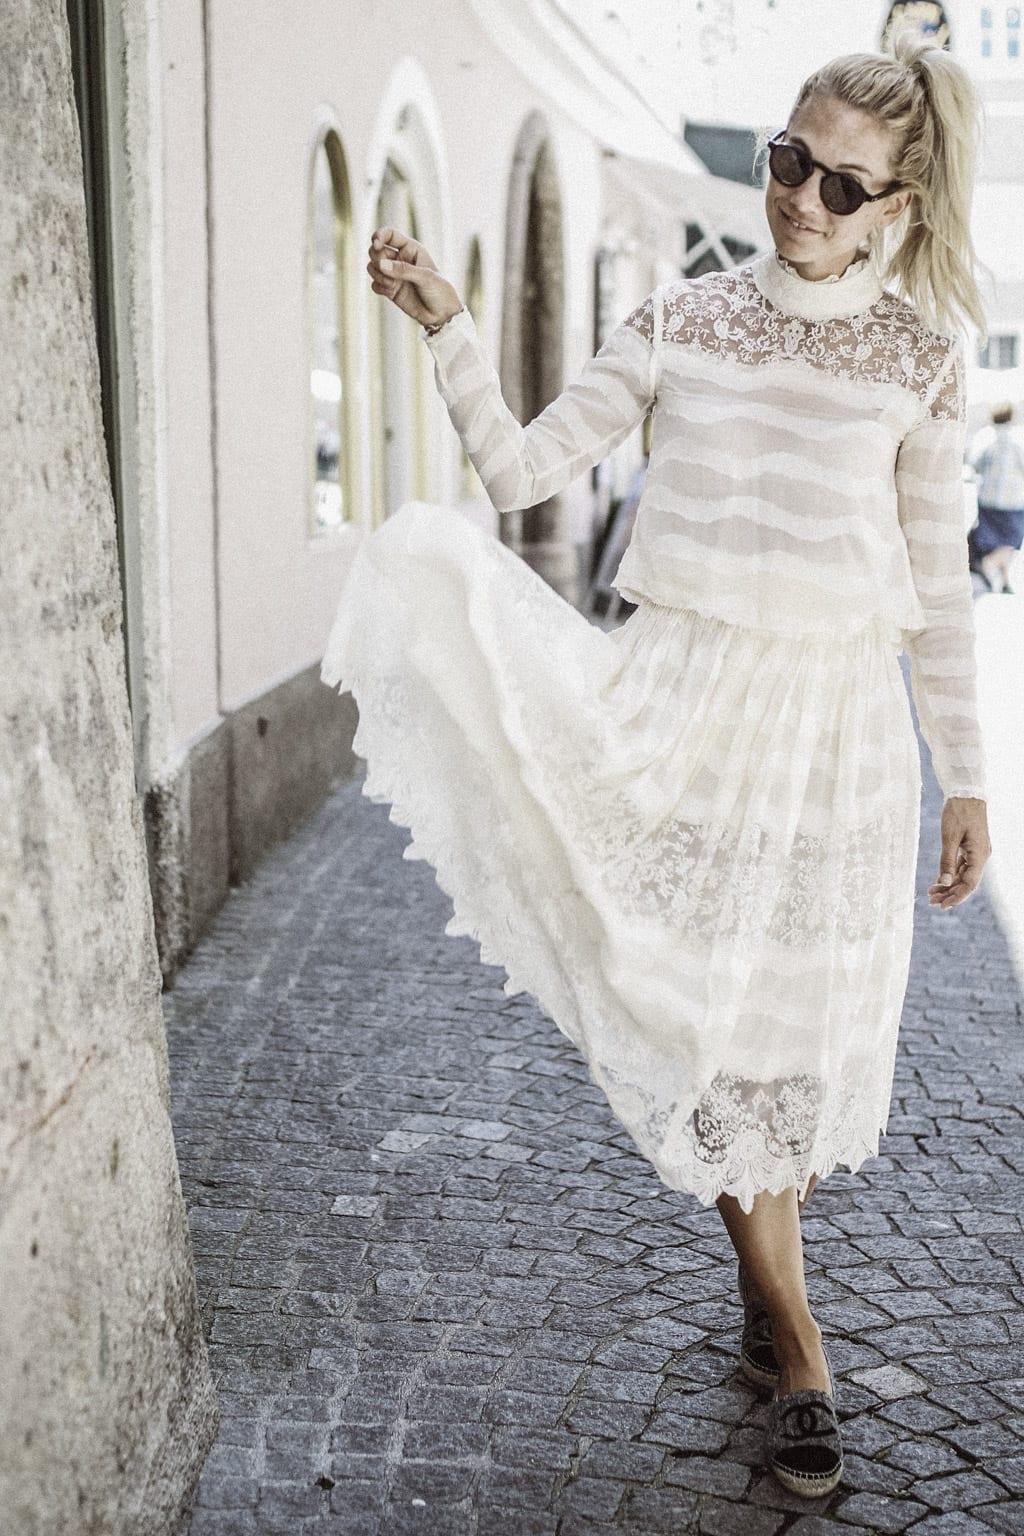 CK-1606-salzburg-austria-fashion-street-style-summer-spring-blog-karin-kaswurm-hm-kleid-2882